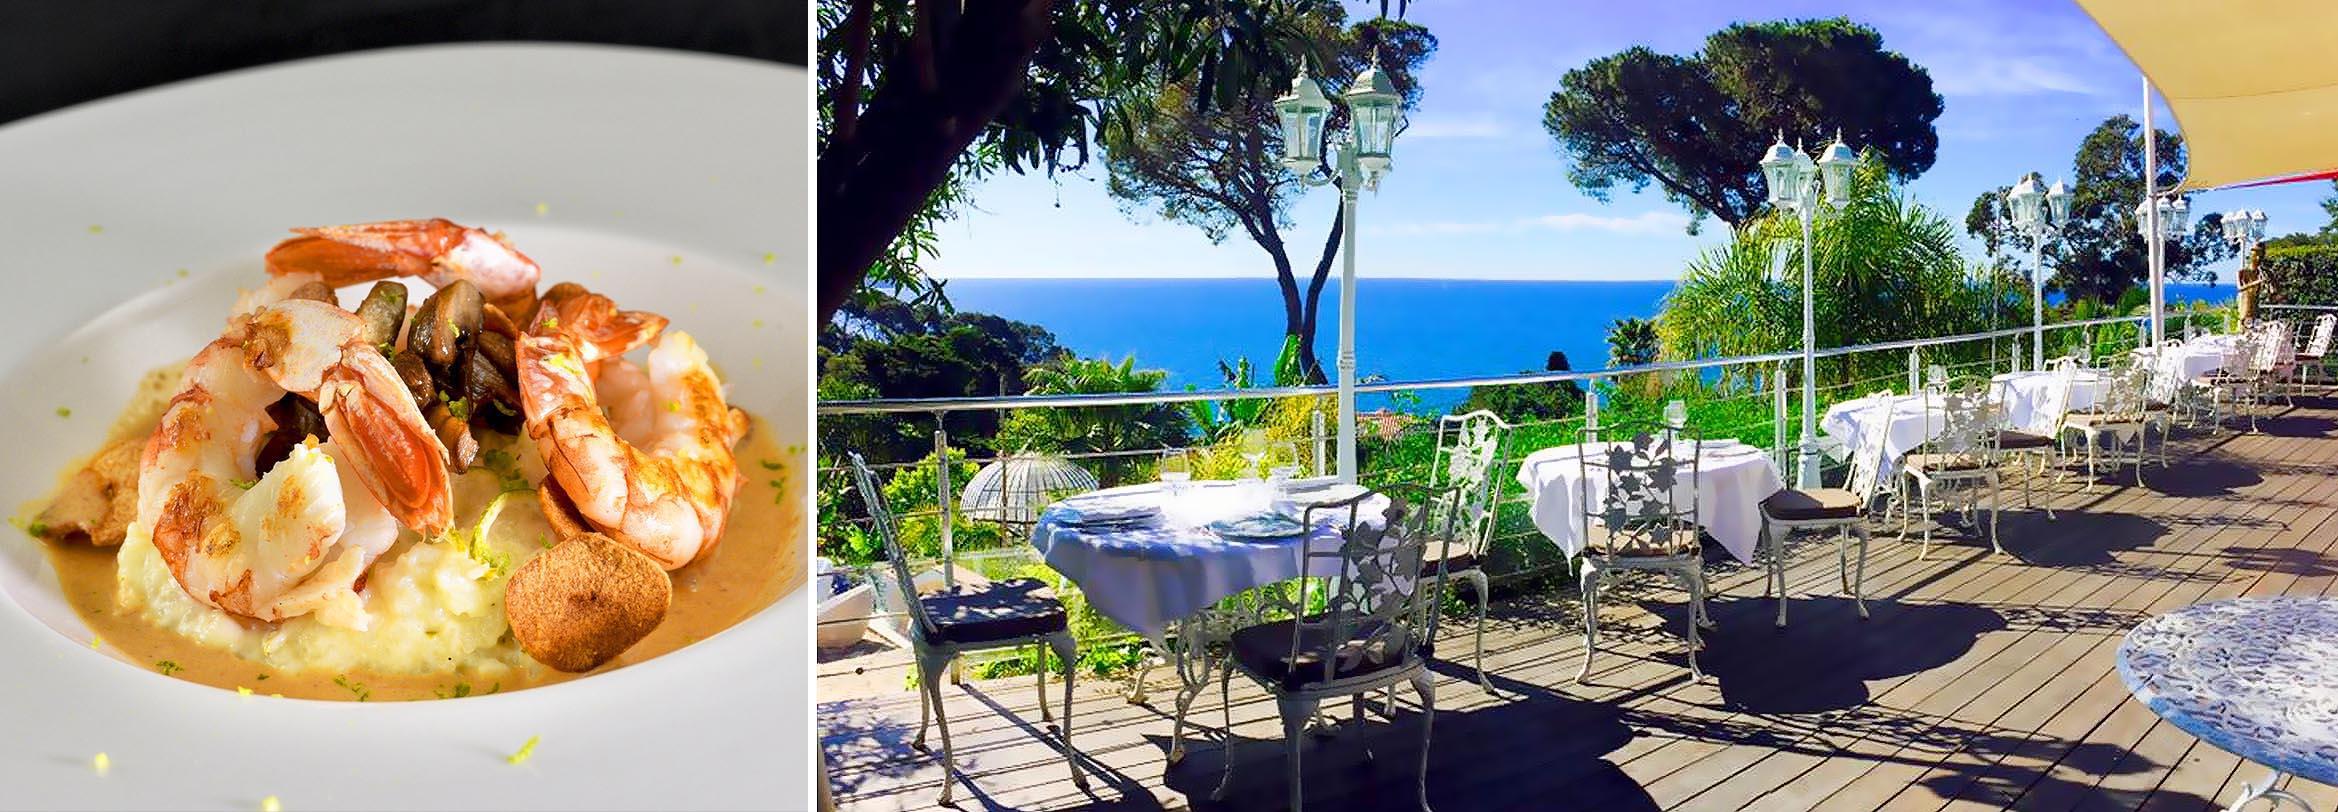 Où manger à Toulon ?